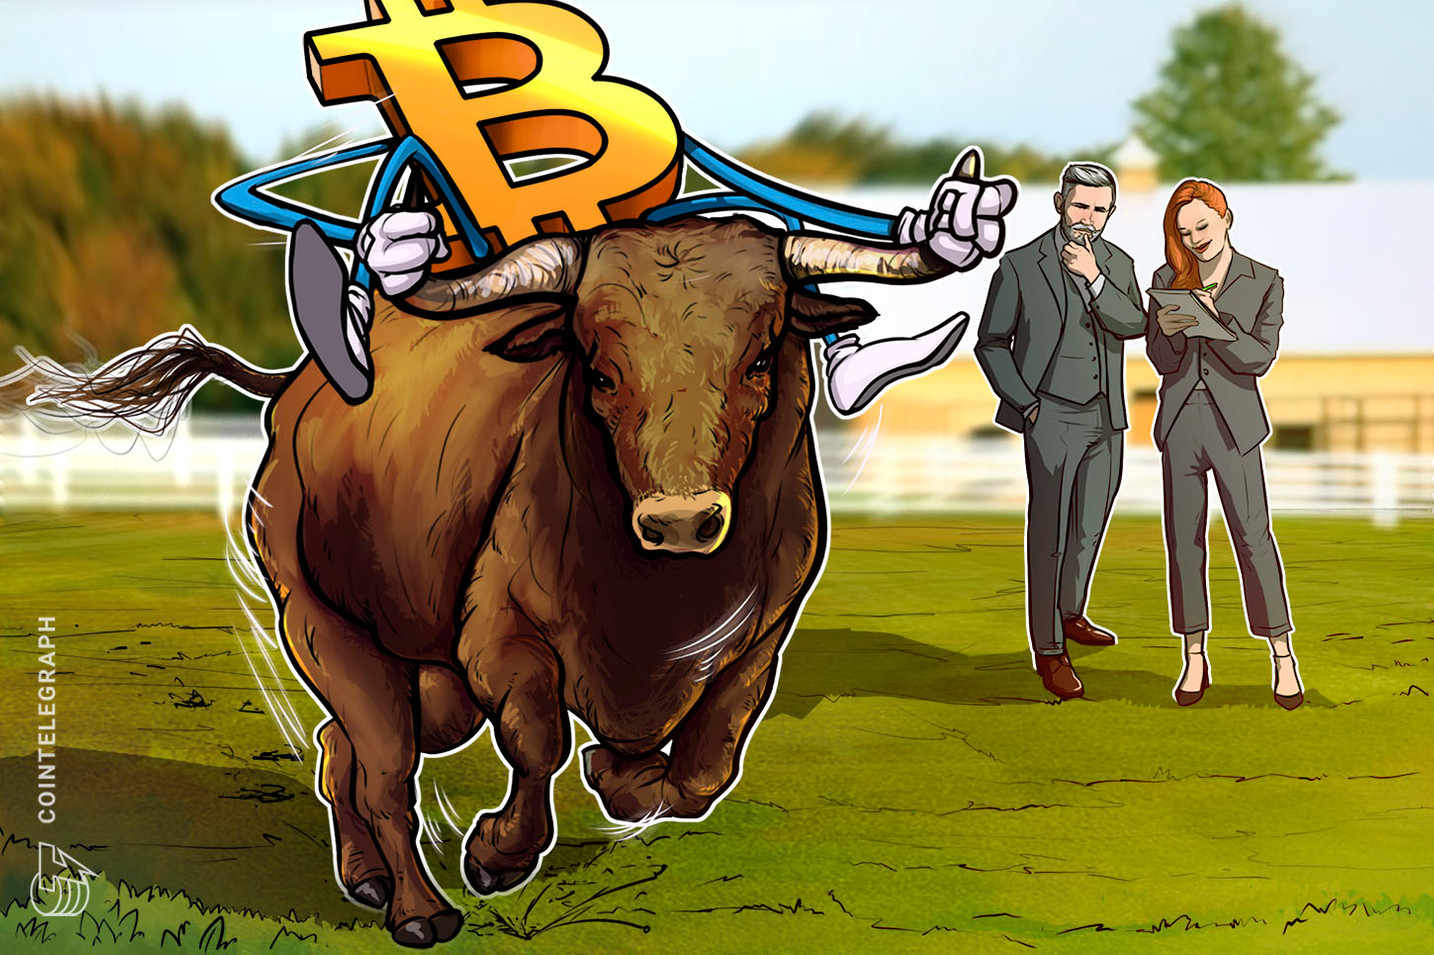 Executivo da Kraken: 5 razões pelas quais o Bitcoin está 'no início de uma bull run'